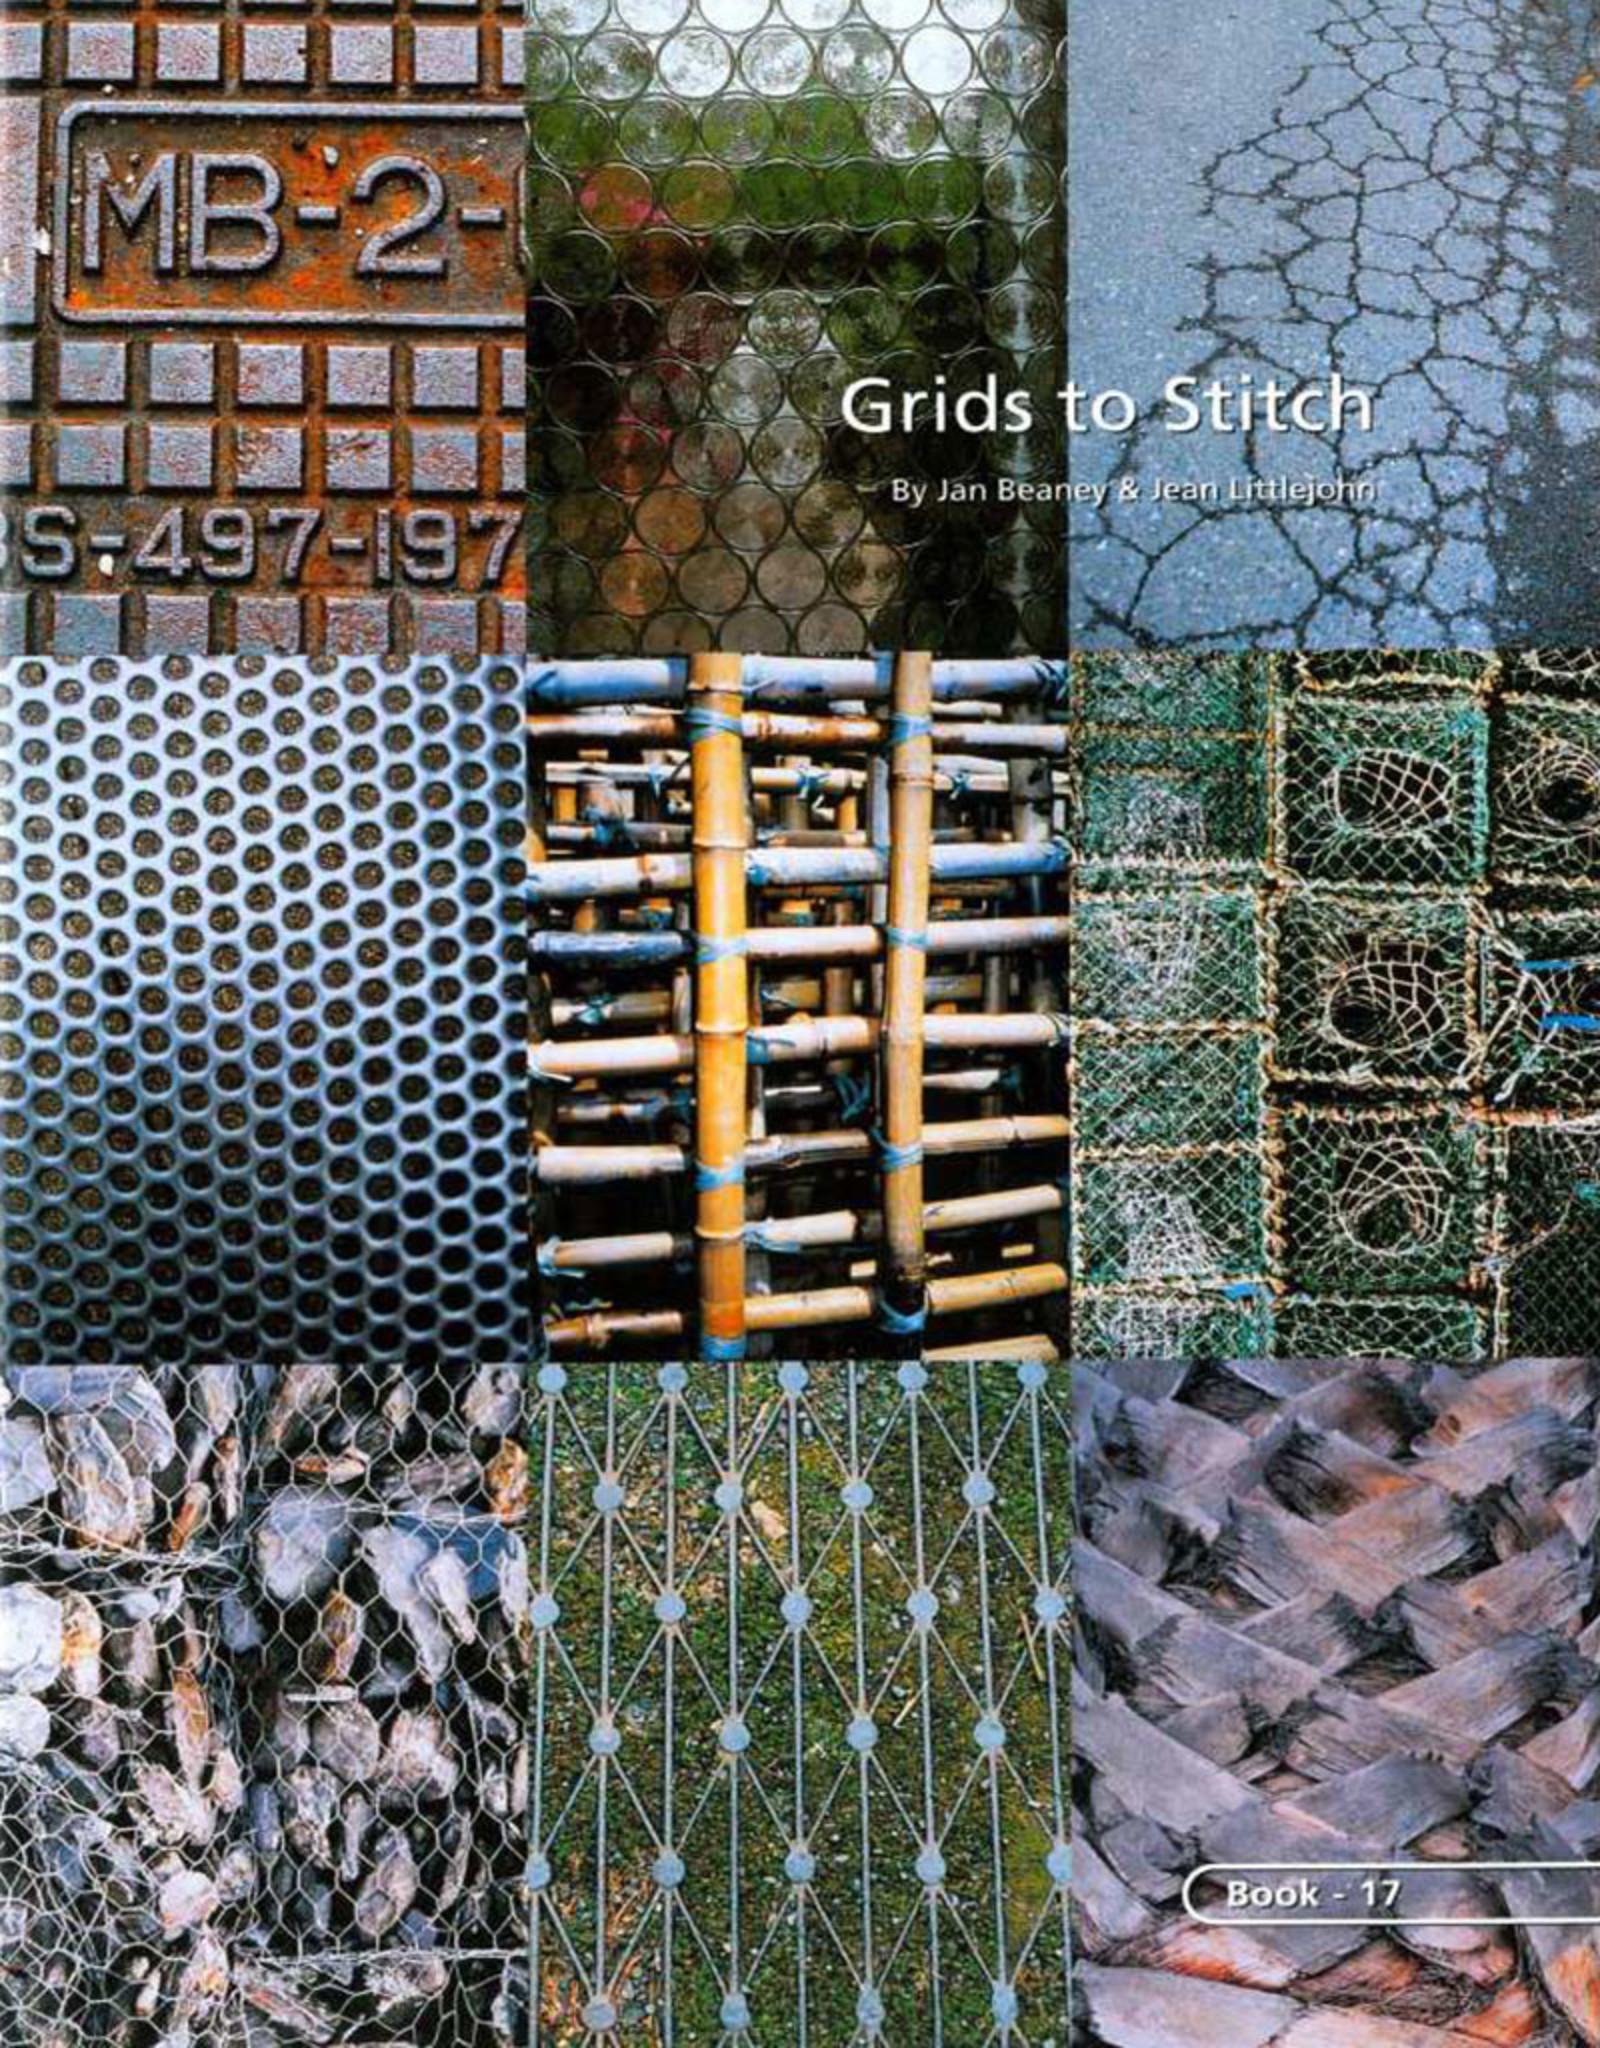 Grids to Stitch / Jan Beaney & Jean Littlejohn